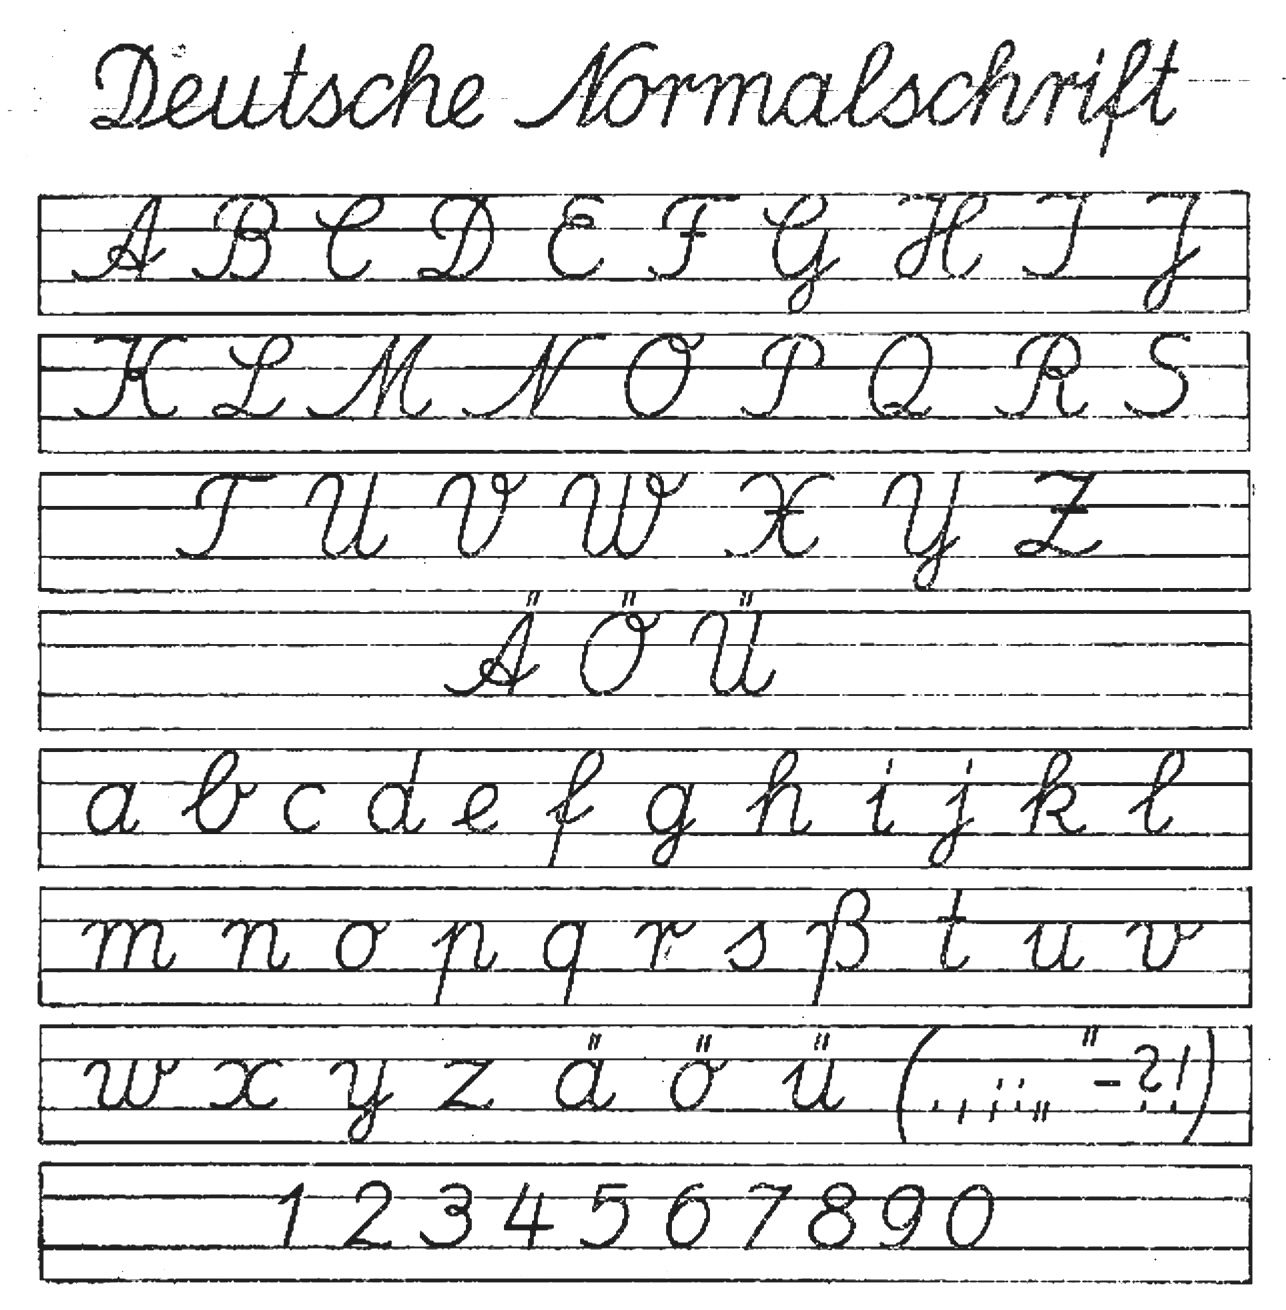 Deutsche normalschrift ab 01091941 - Ausgangsschrift – Wikipedia ...